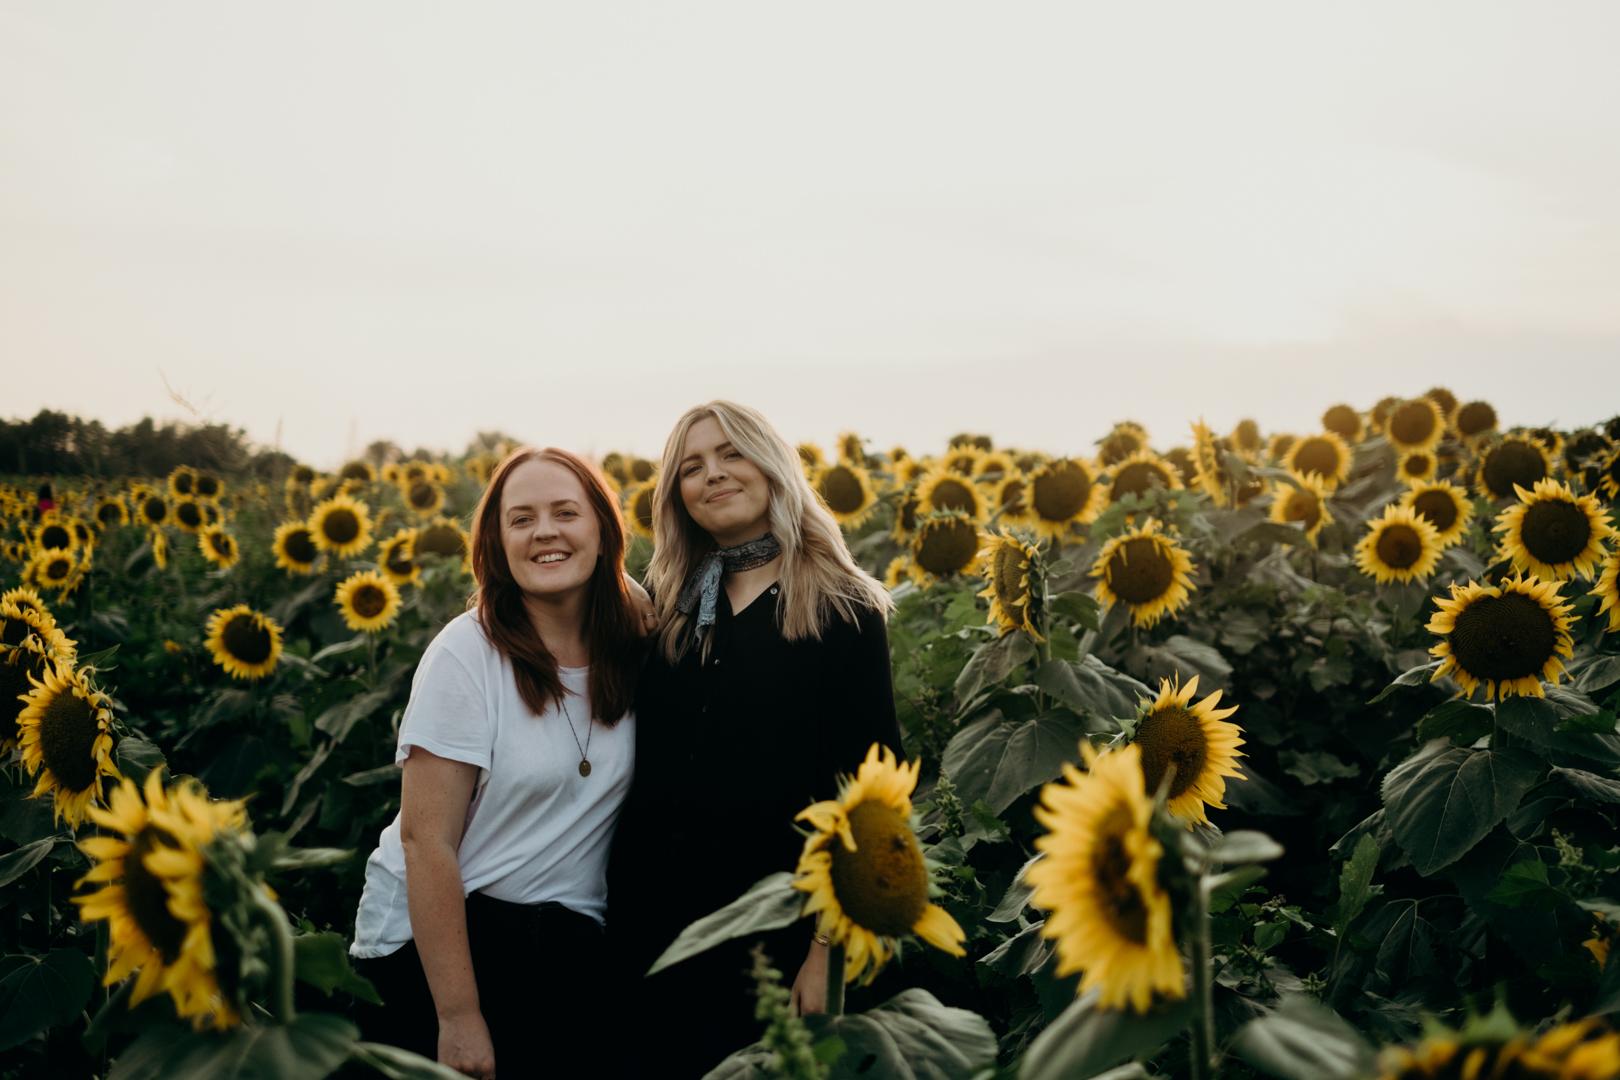 20170909_Grinters Farms Sunflower Fields Lawrence Kansas__23.jpg